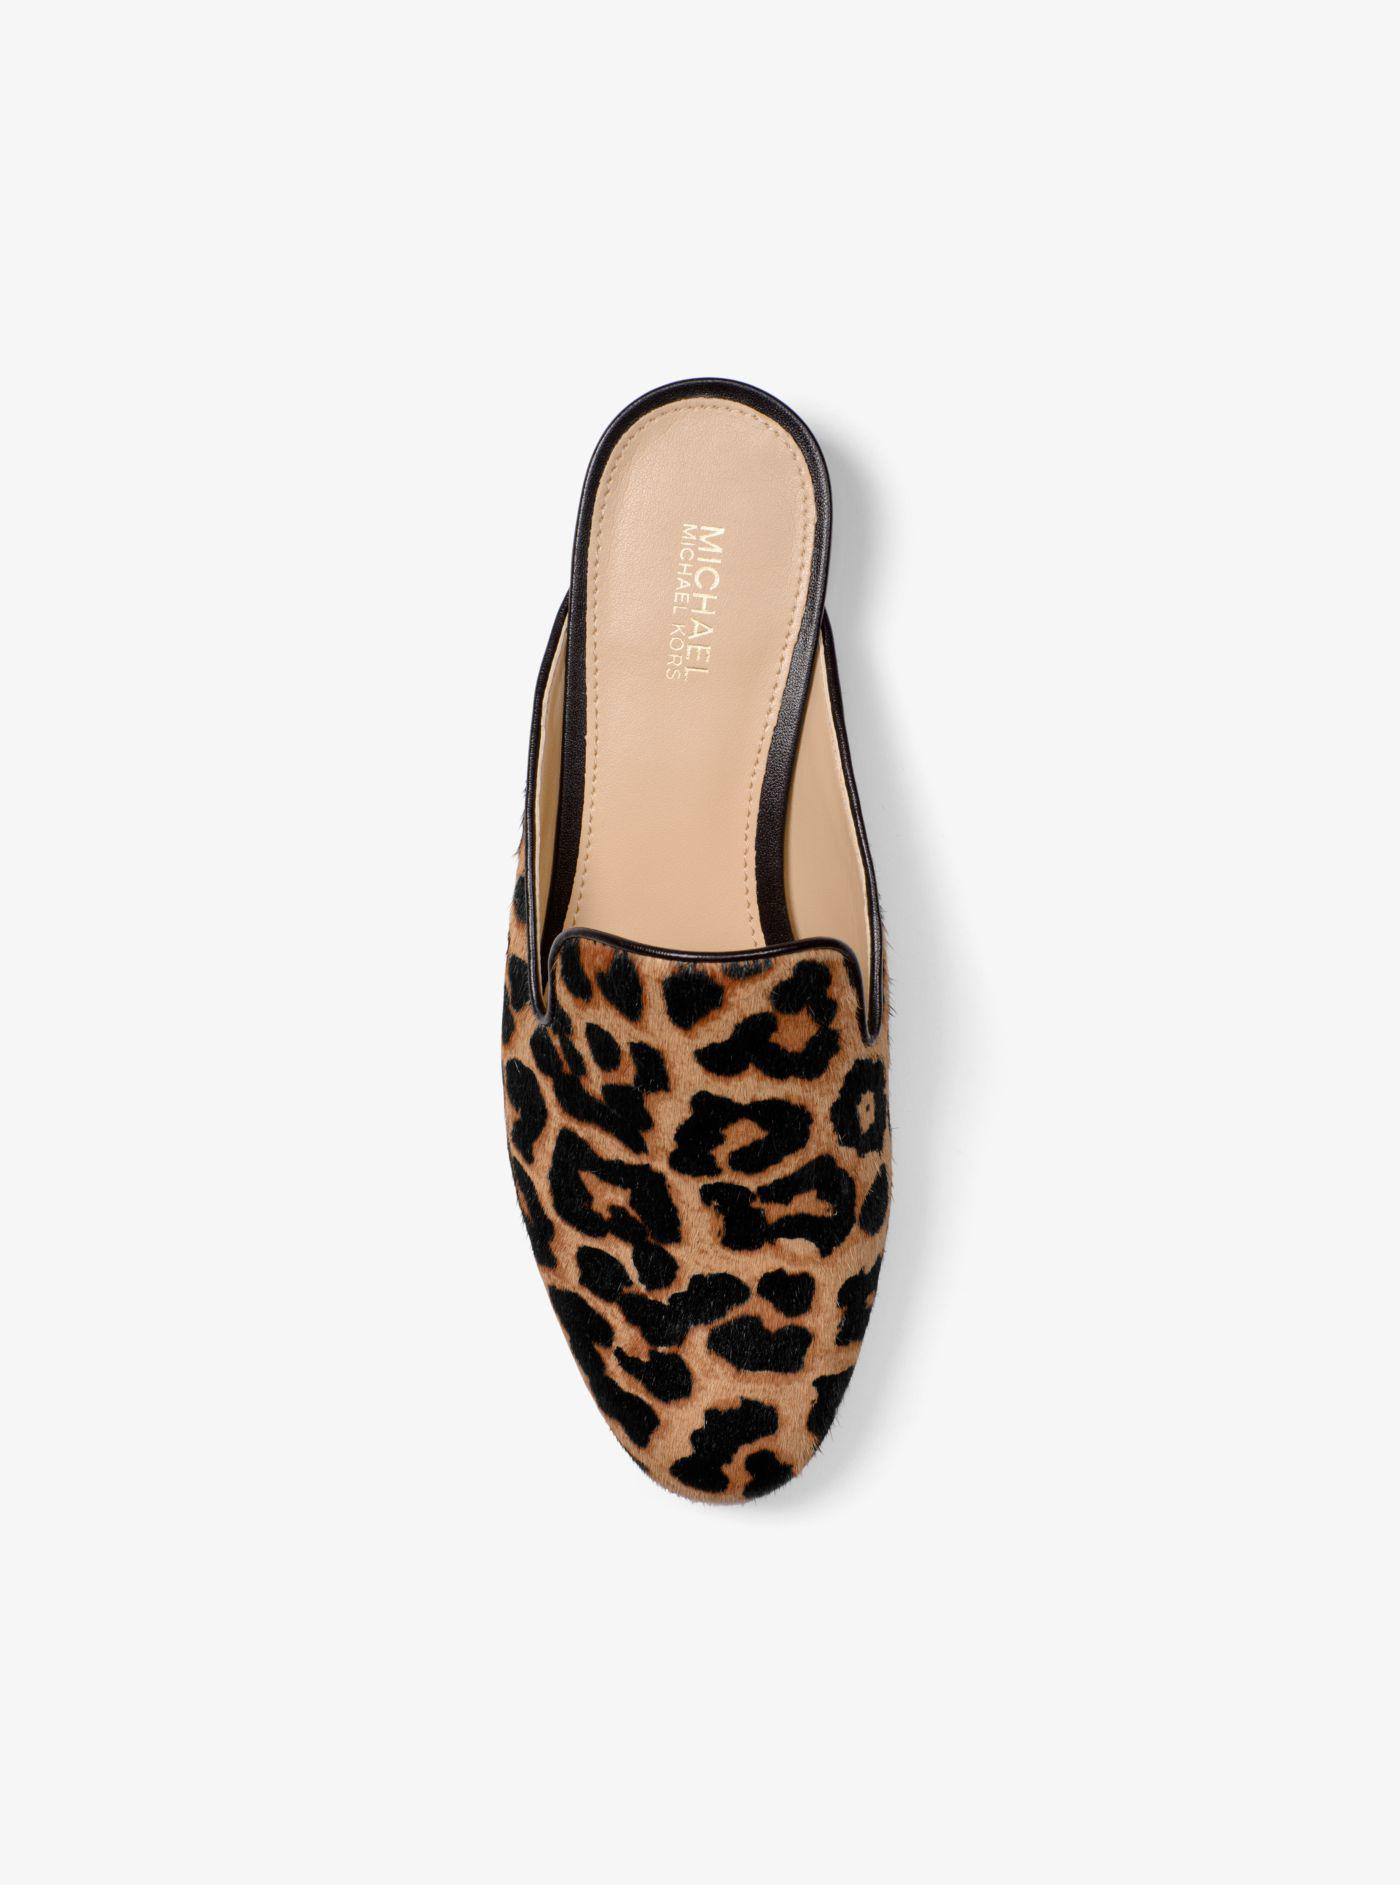 d208defee616 Michael Kors Natasha Leopard Calf Hair Slide - Lyst